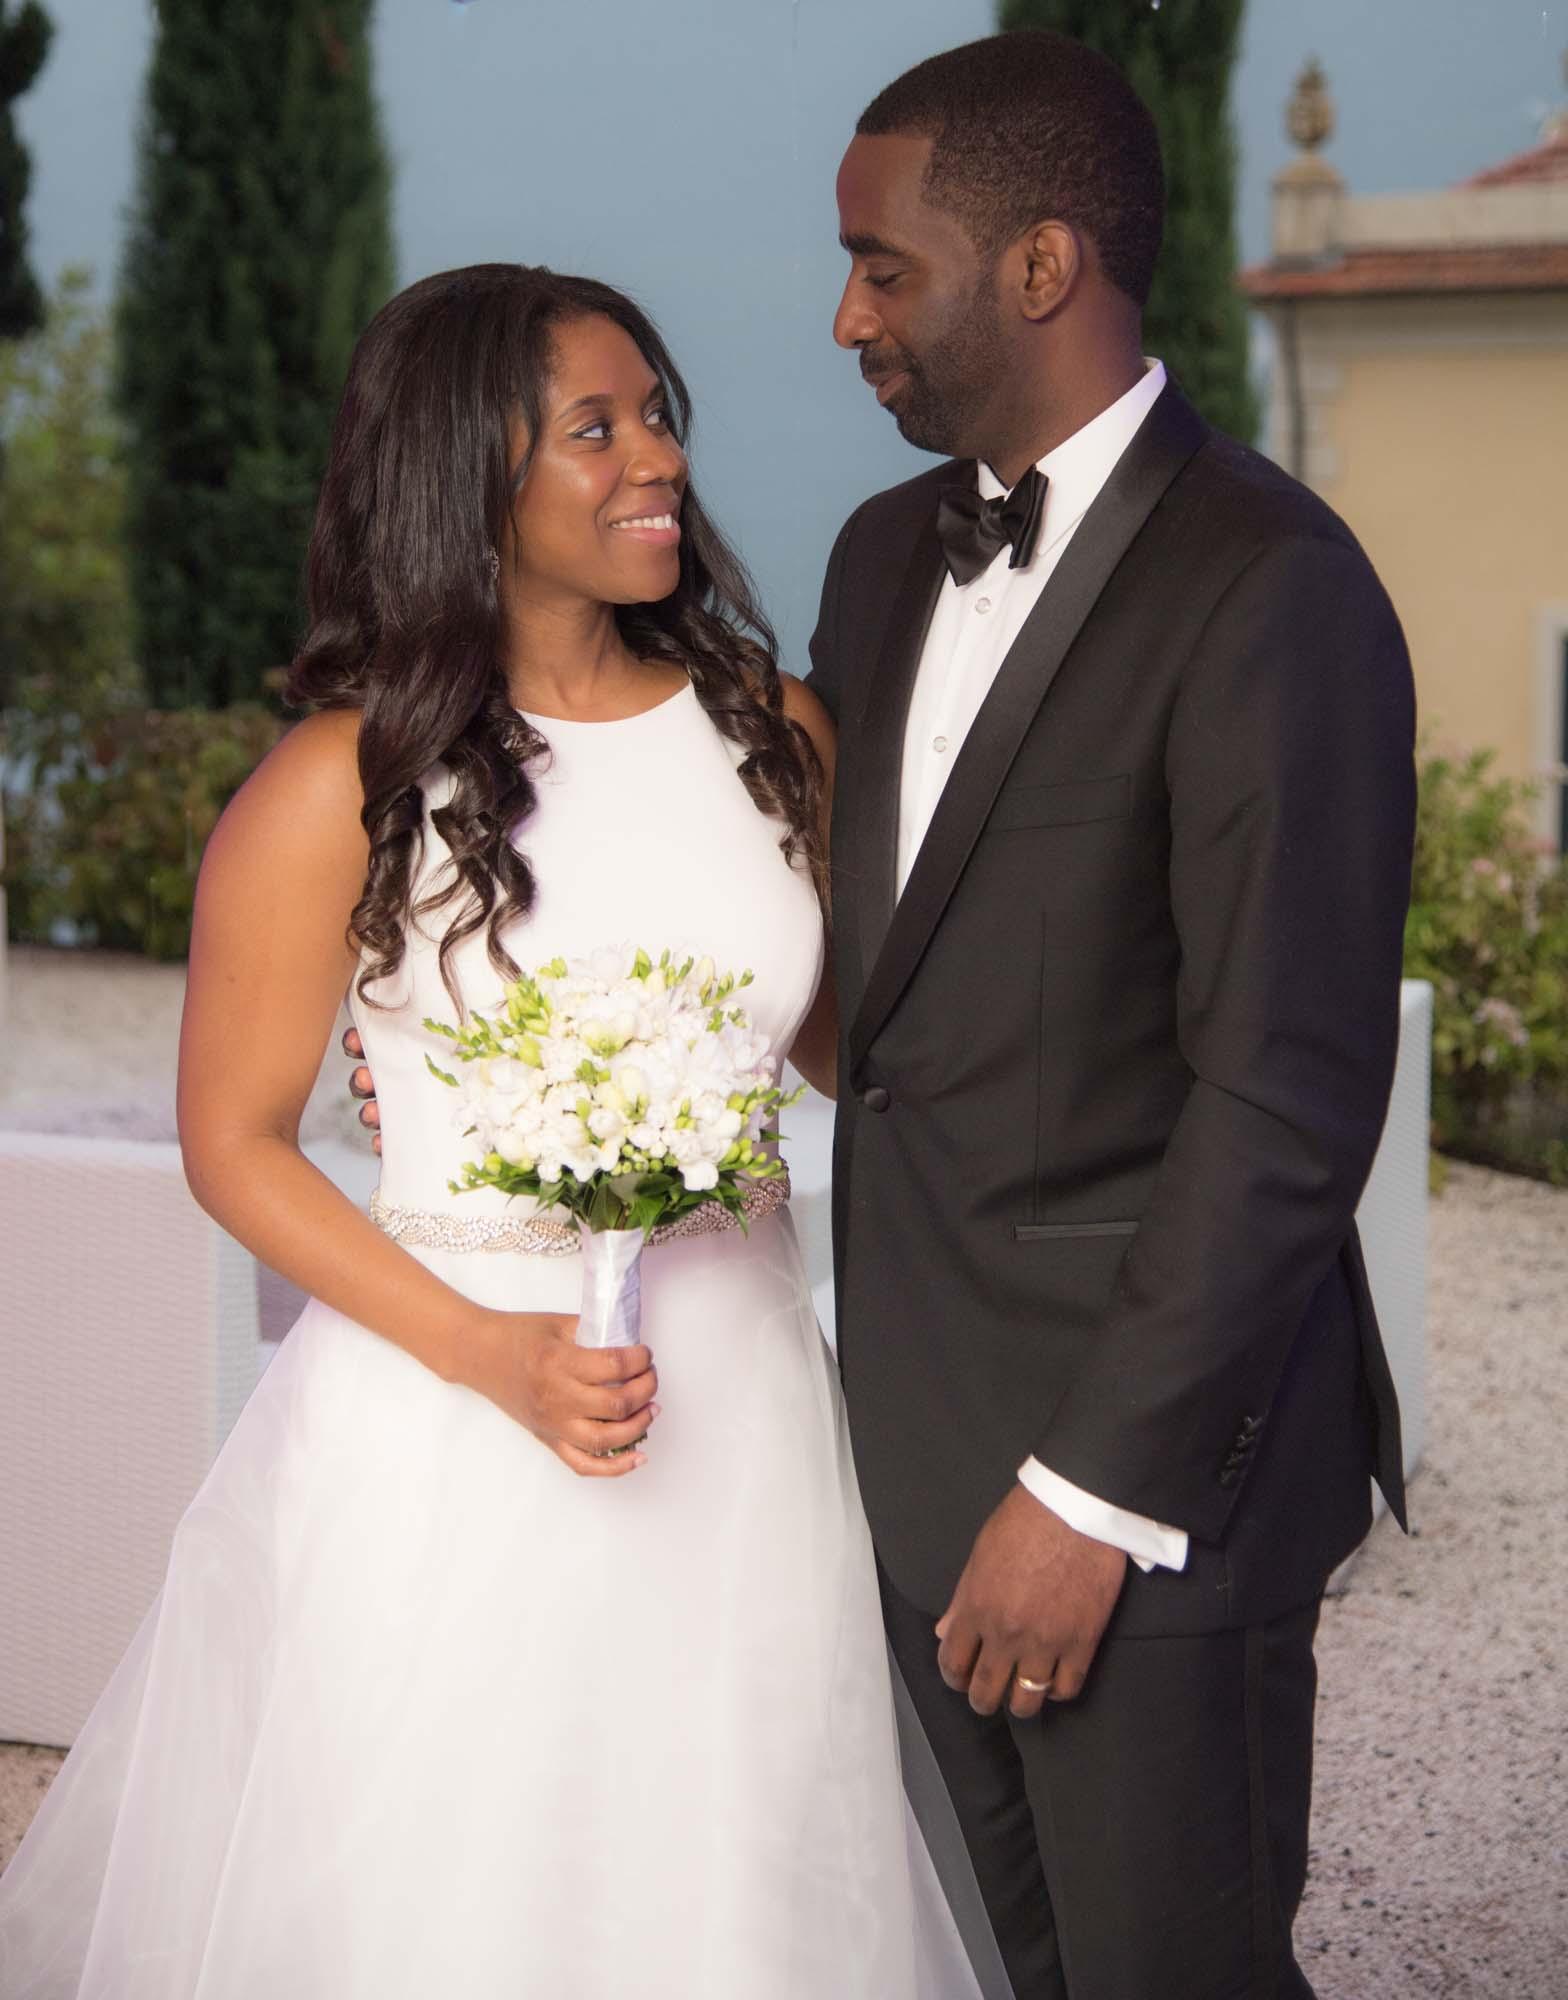 Lake-Como-Italy-Wedding-Jamie-Levine-Photography-21.jpg